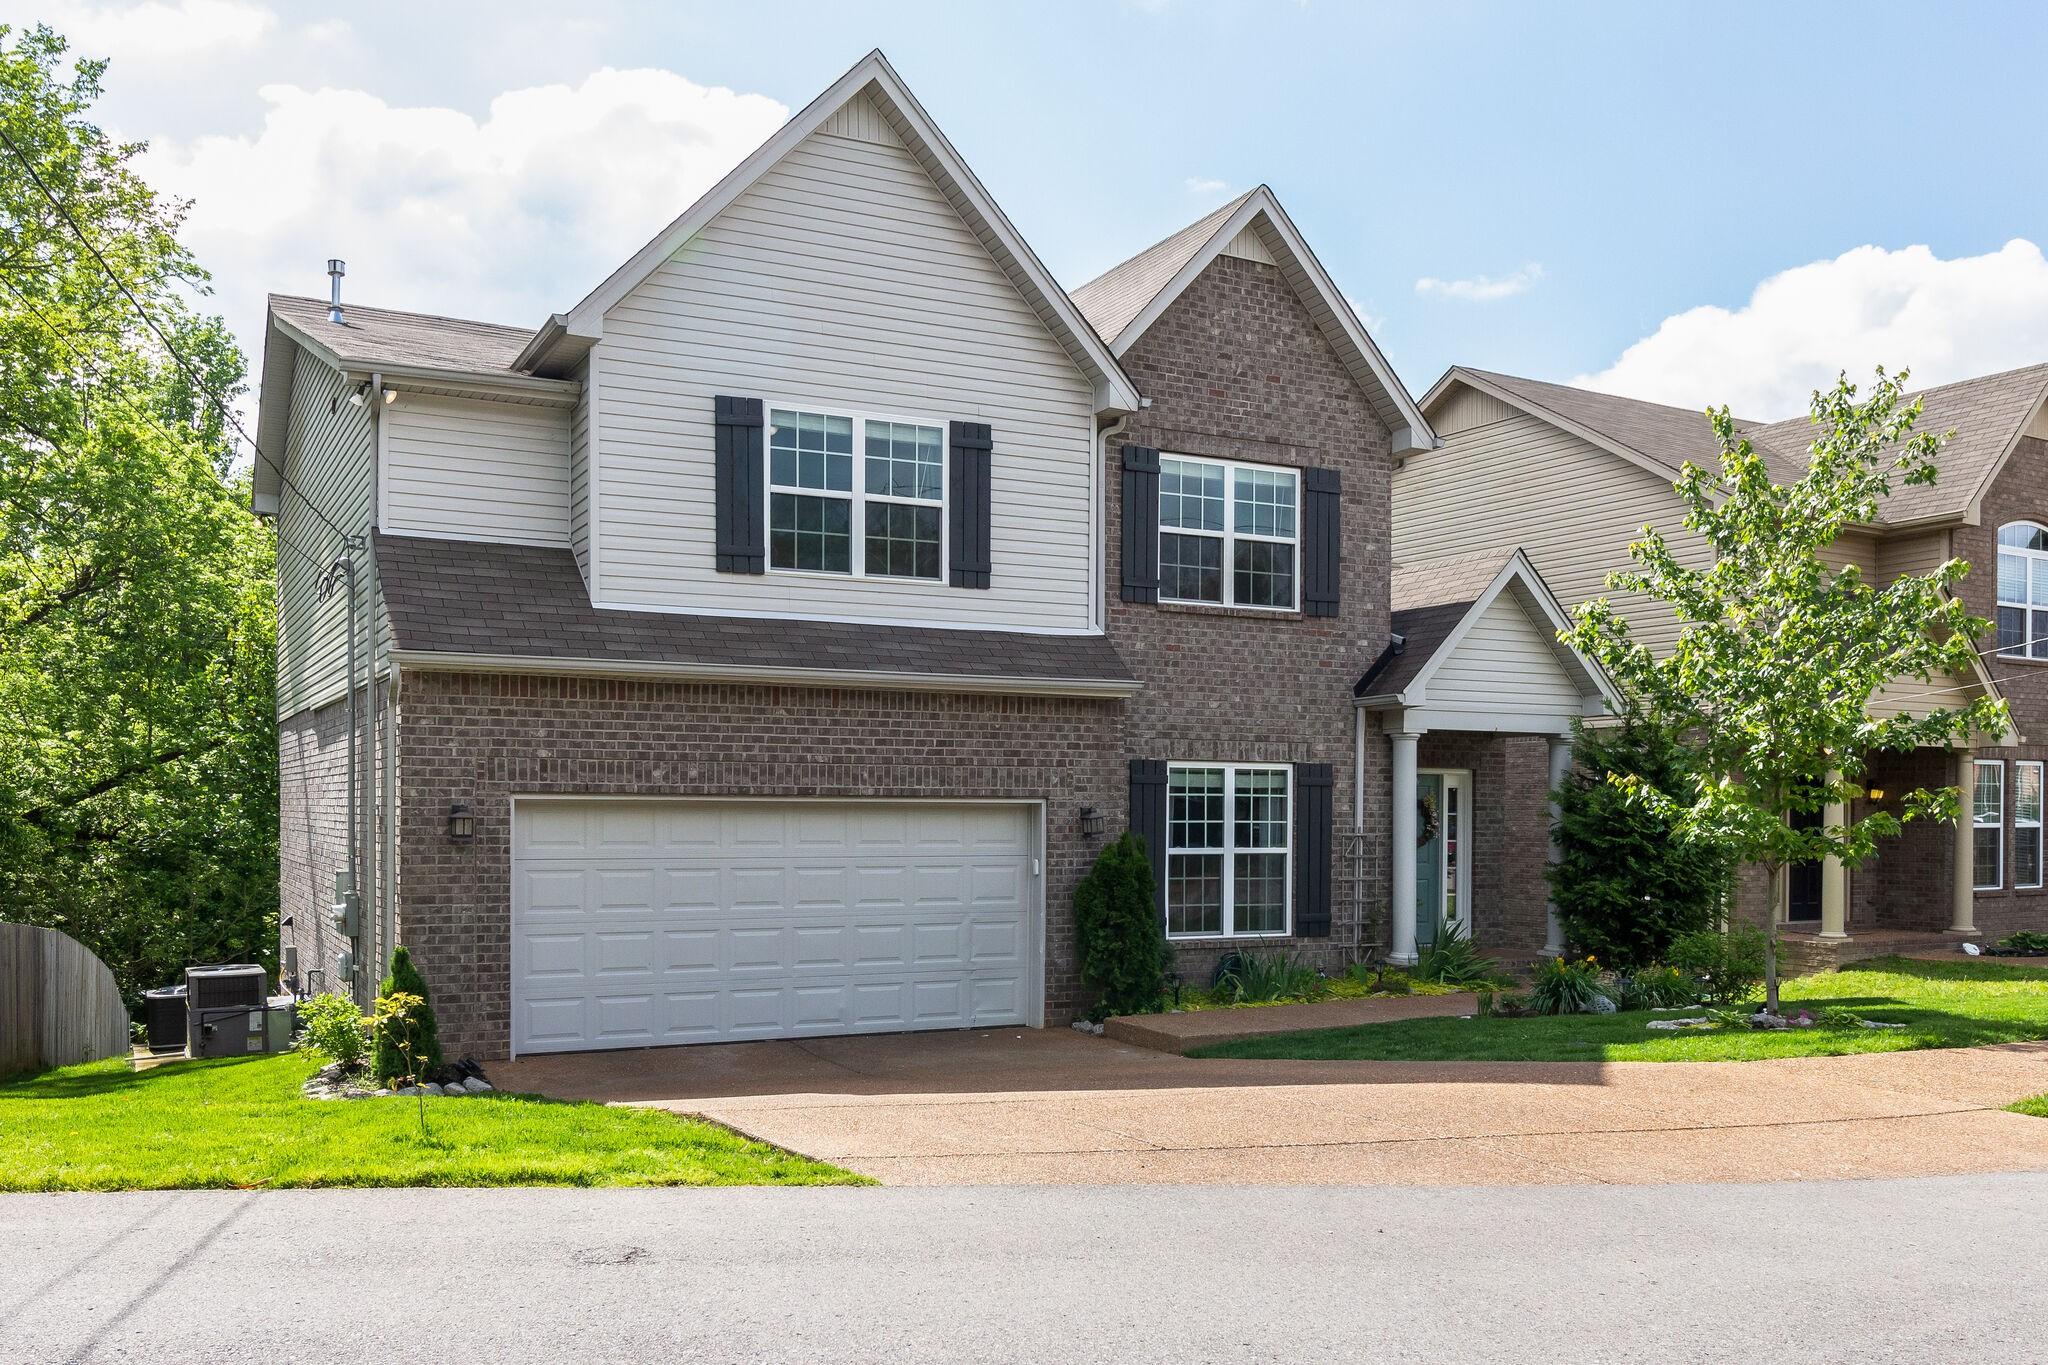 6939 Calderwood Dr, Nashville-Antioch, Tennessee